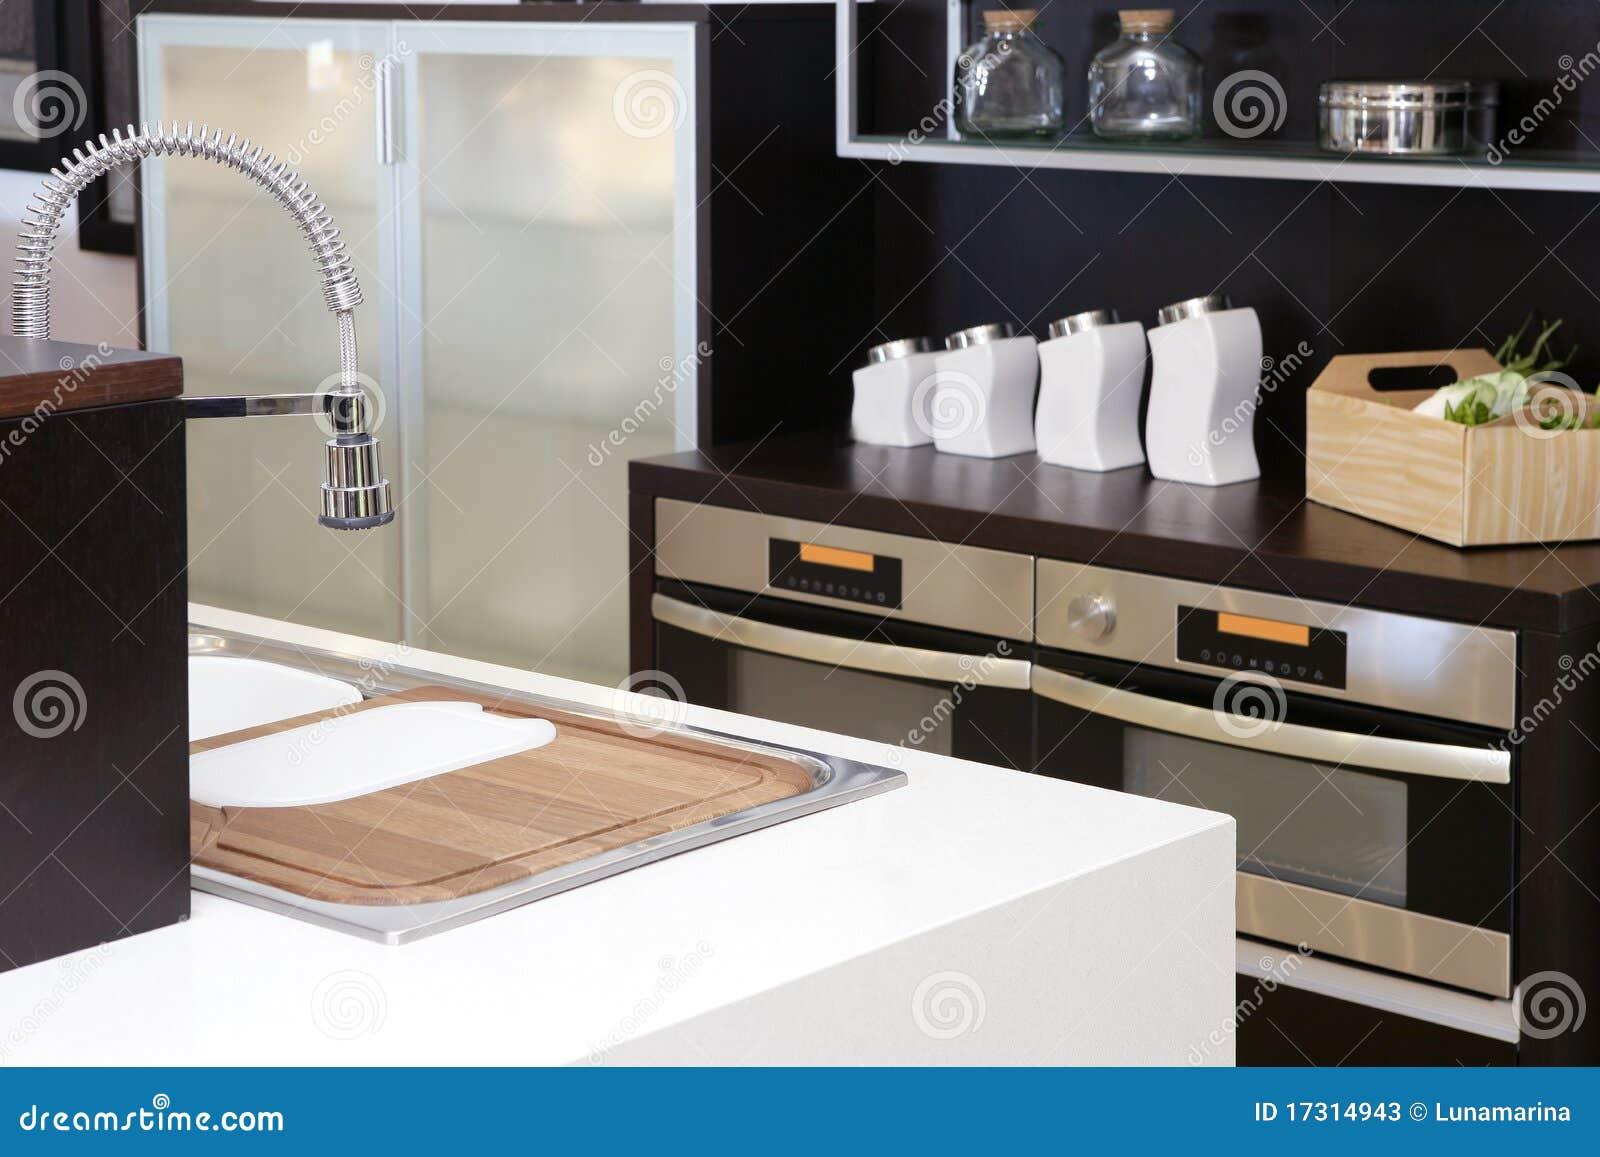 Bruin houten keuken modern roestvrij staal stock afbeelding afbeelding 17314943 - Huis roestvrij staal ...